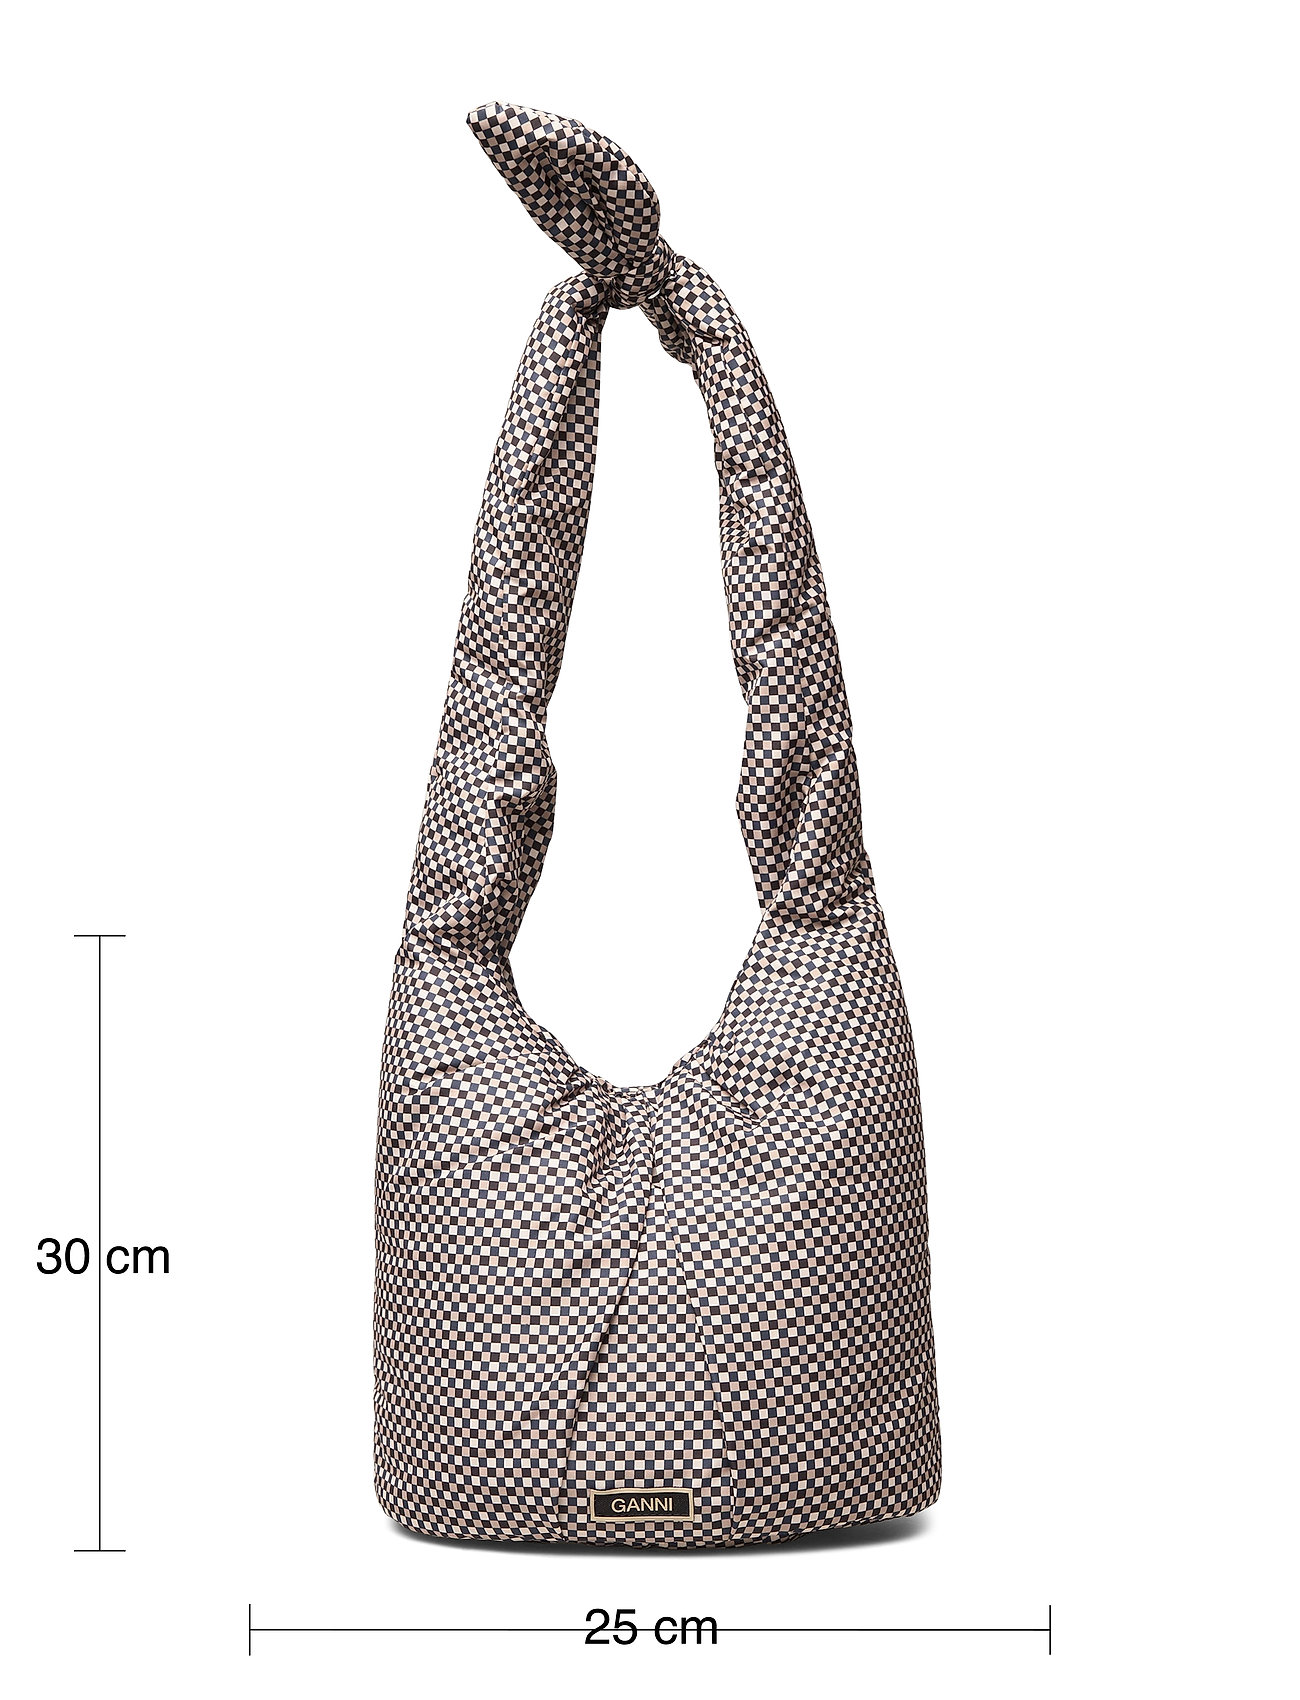 Ganni - Tote Bag - shoulder bags - tannin - 5